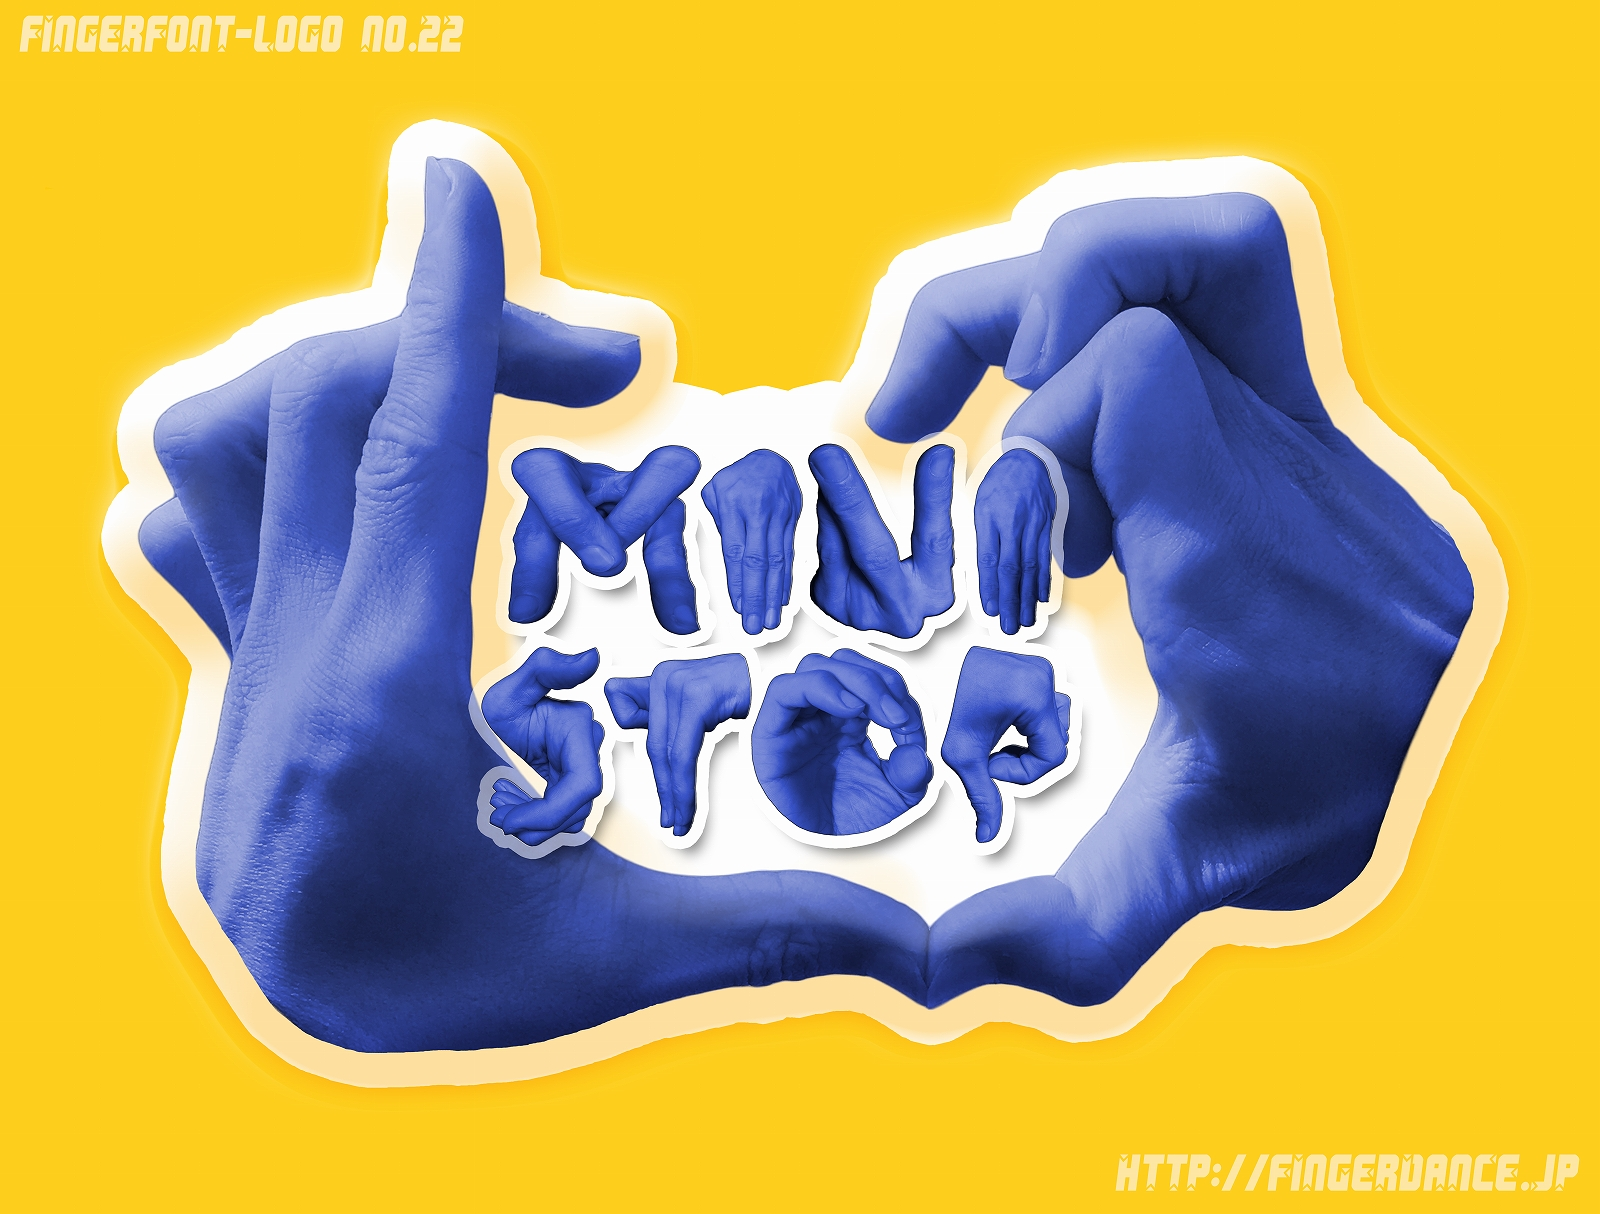 ministop-fingerhttp://fingerdance.jp/L/logohand ミニストップフィンガーロゴハンド手指